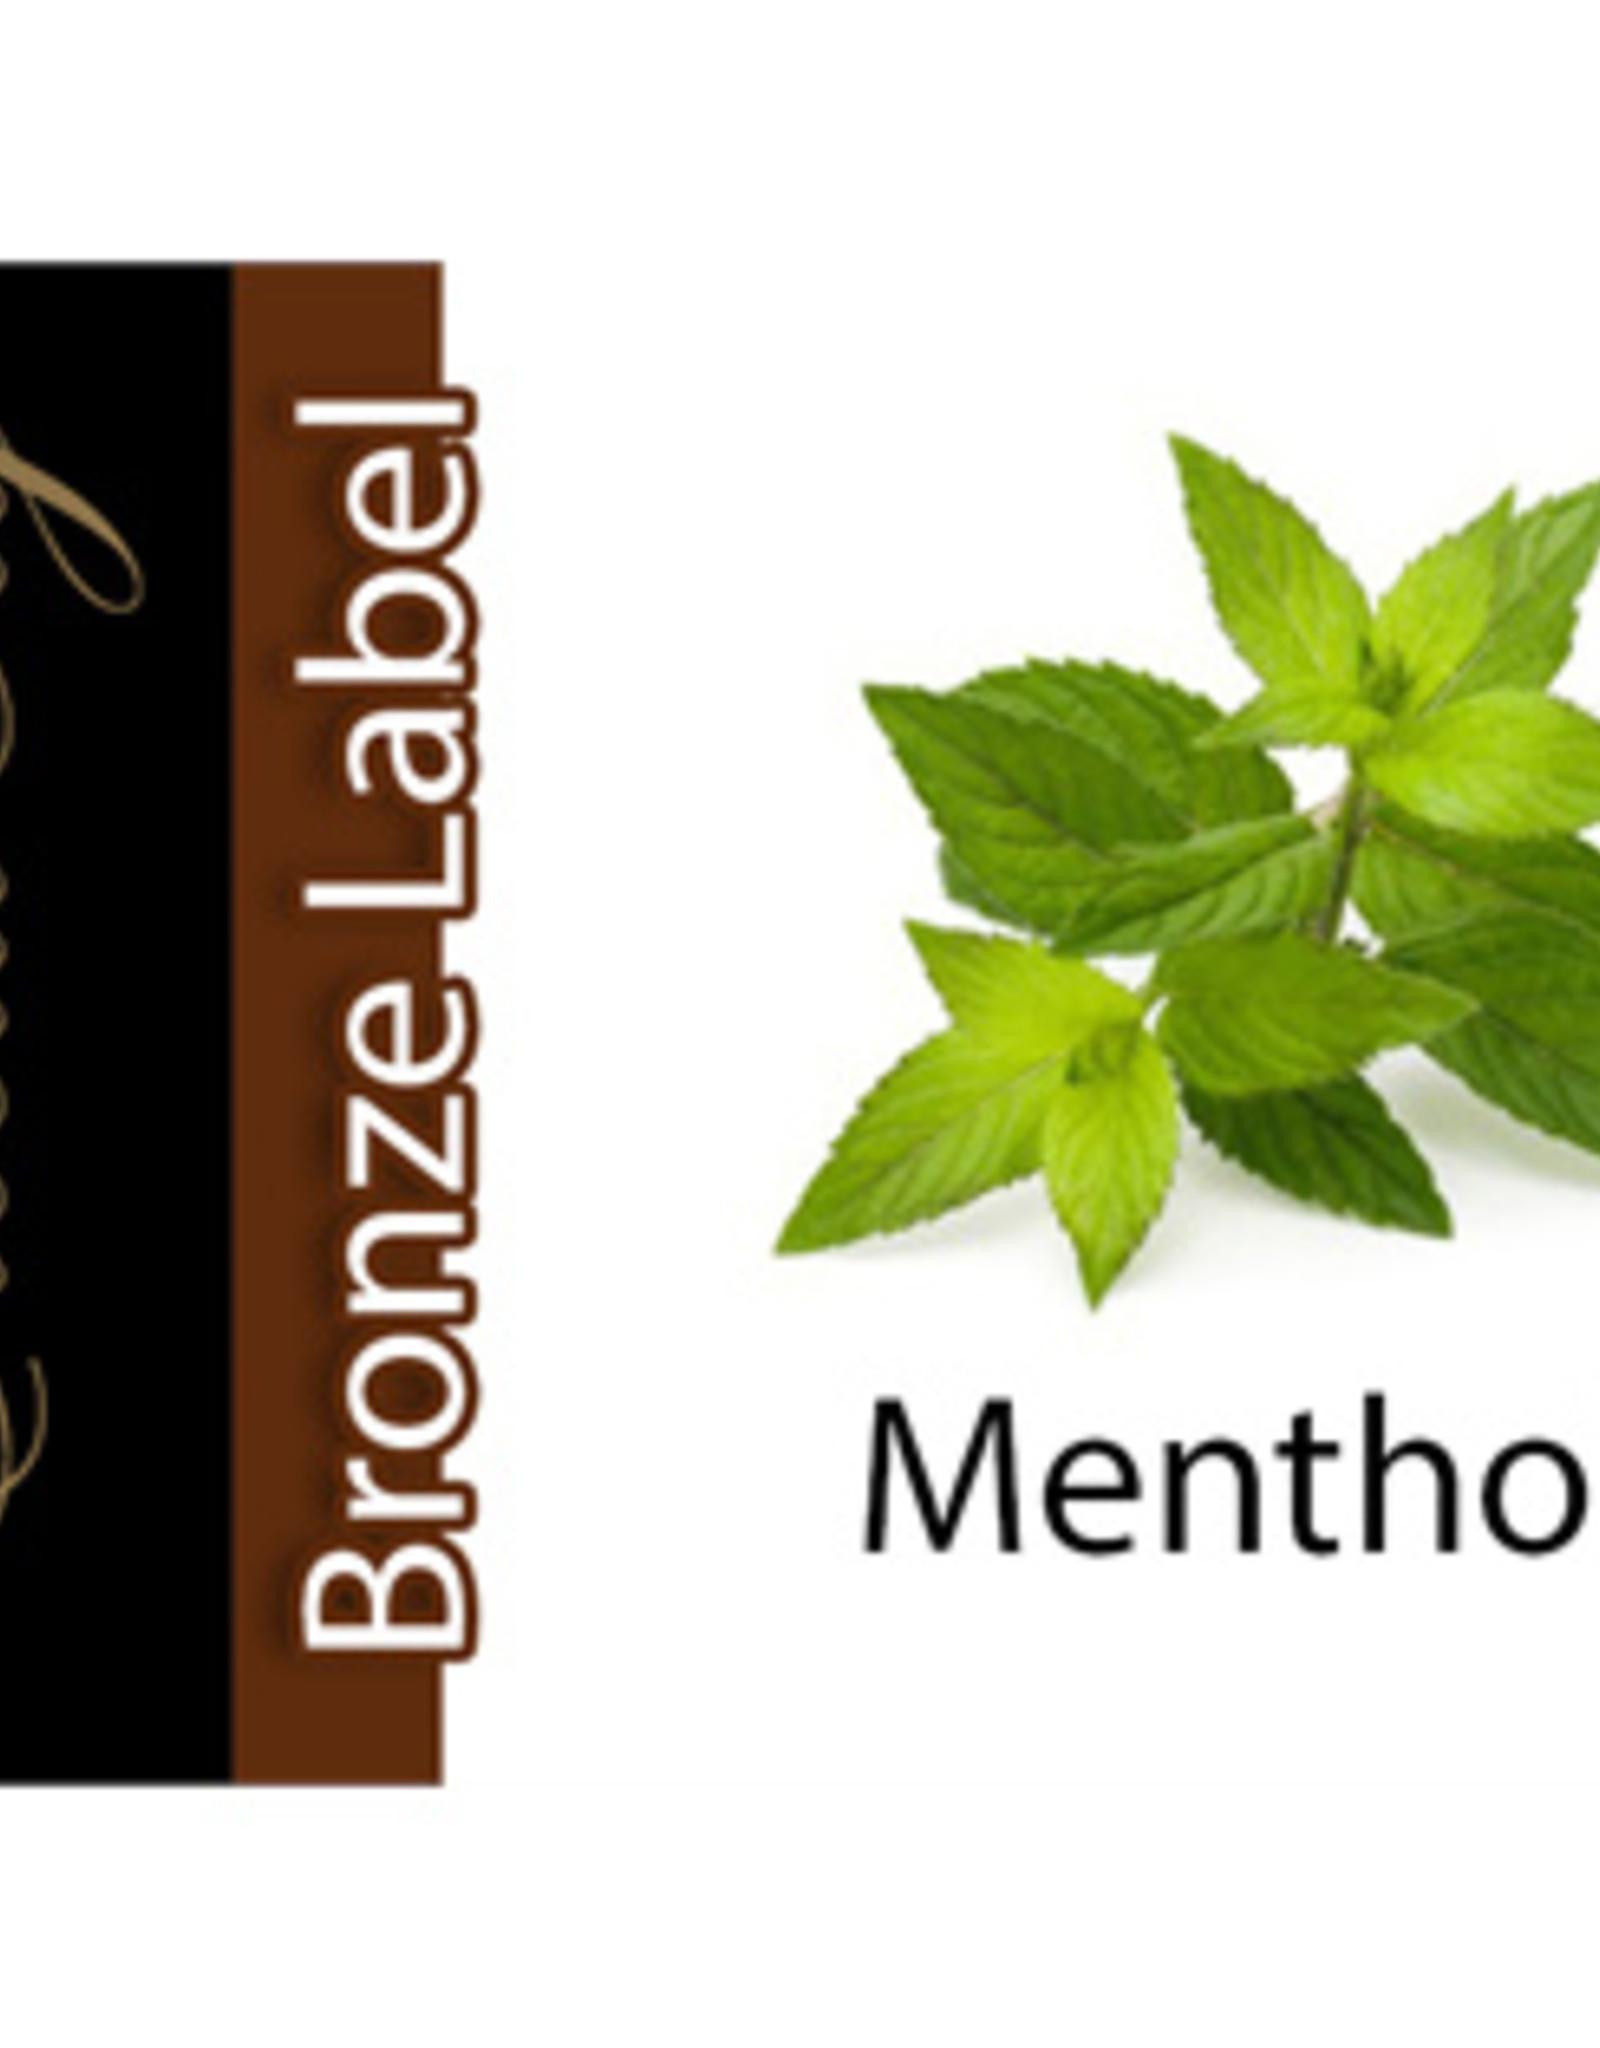 Exclucig Exclucig Bronze Label E-liquid Menthol 3 mg Nicotine